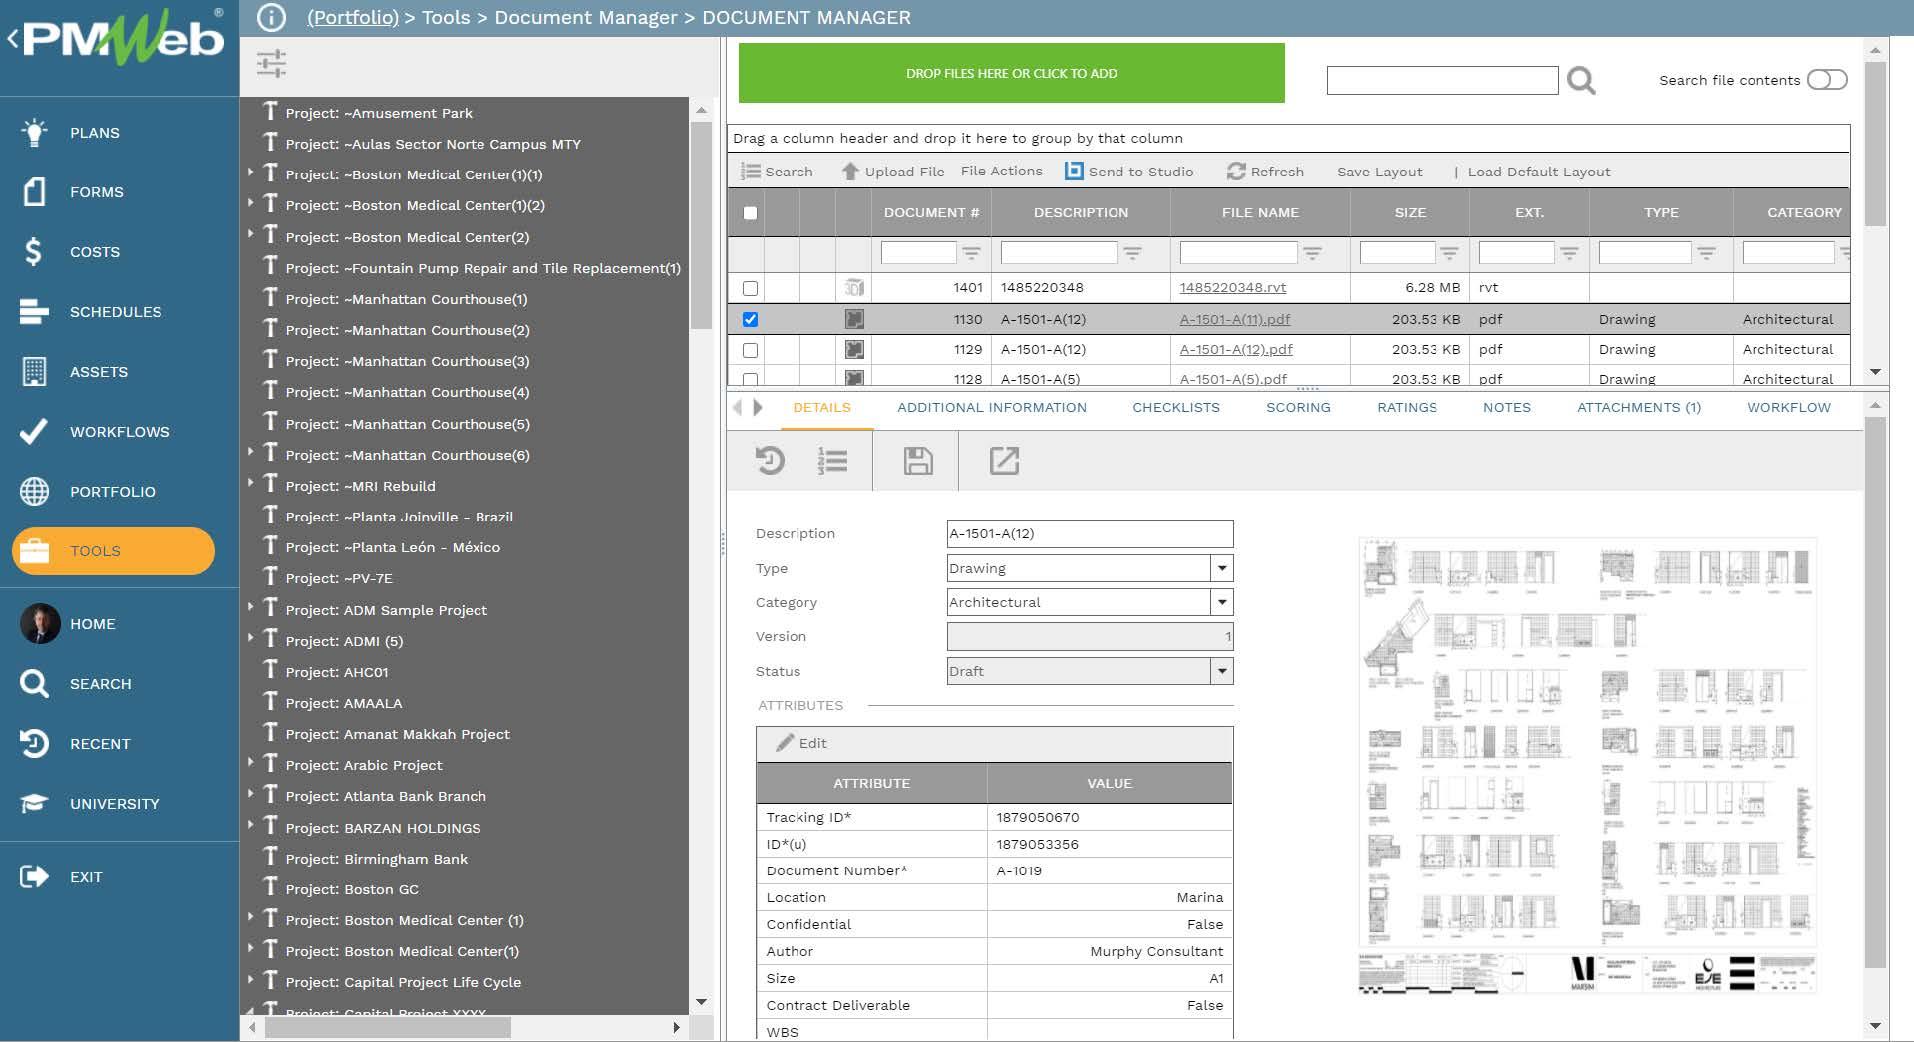 PMWeb 7 Tools Document Manager